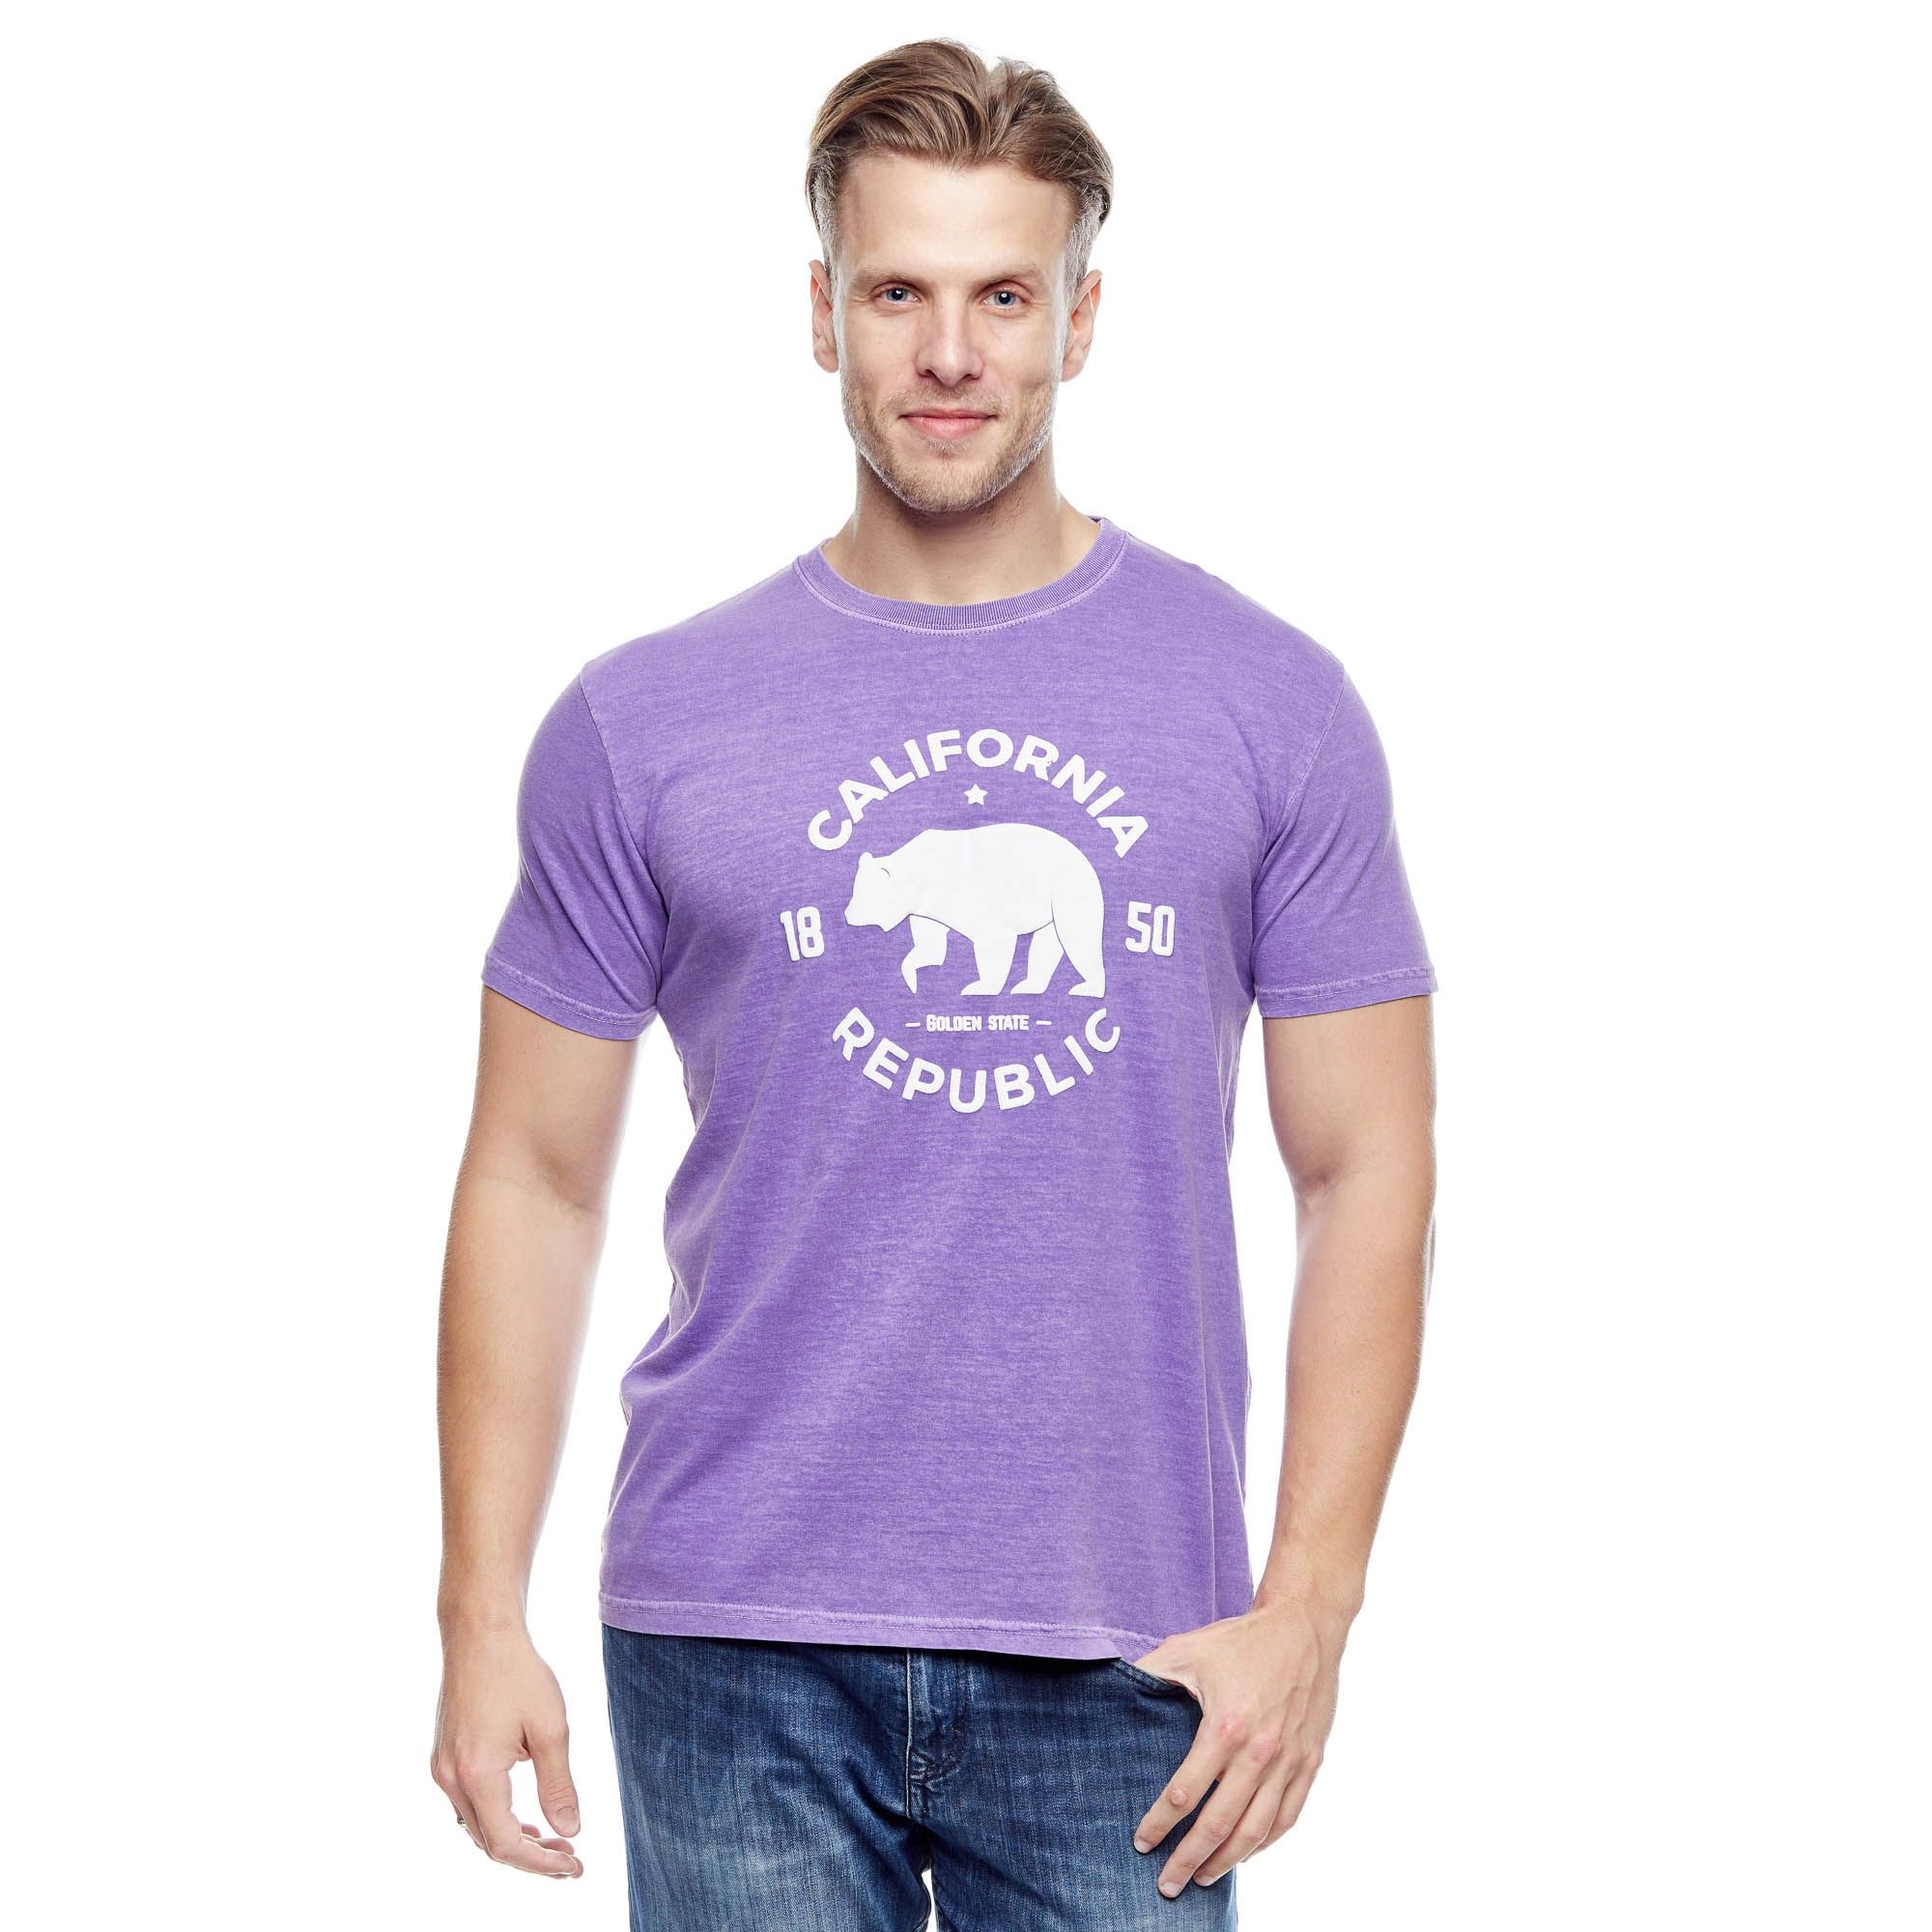 Camiseta Evolvee California Republic Masculina